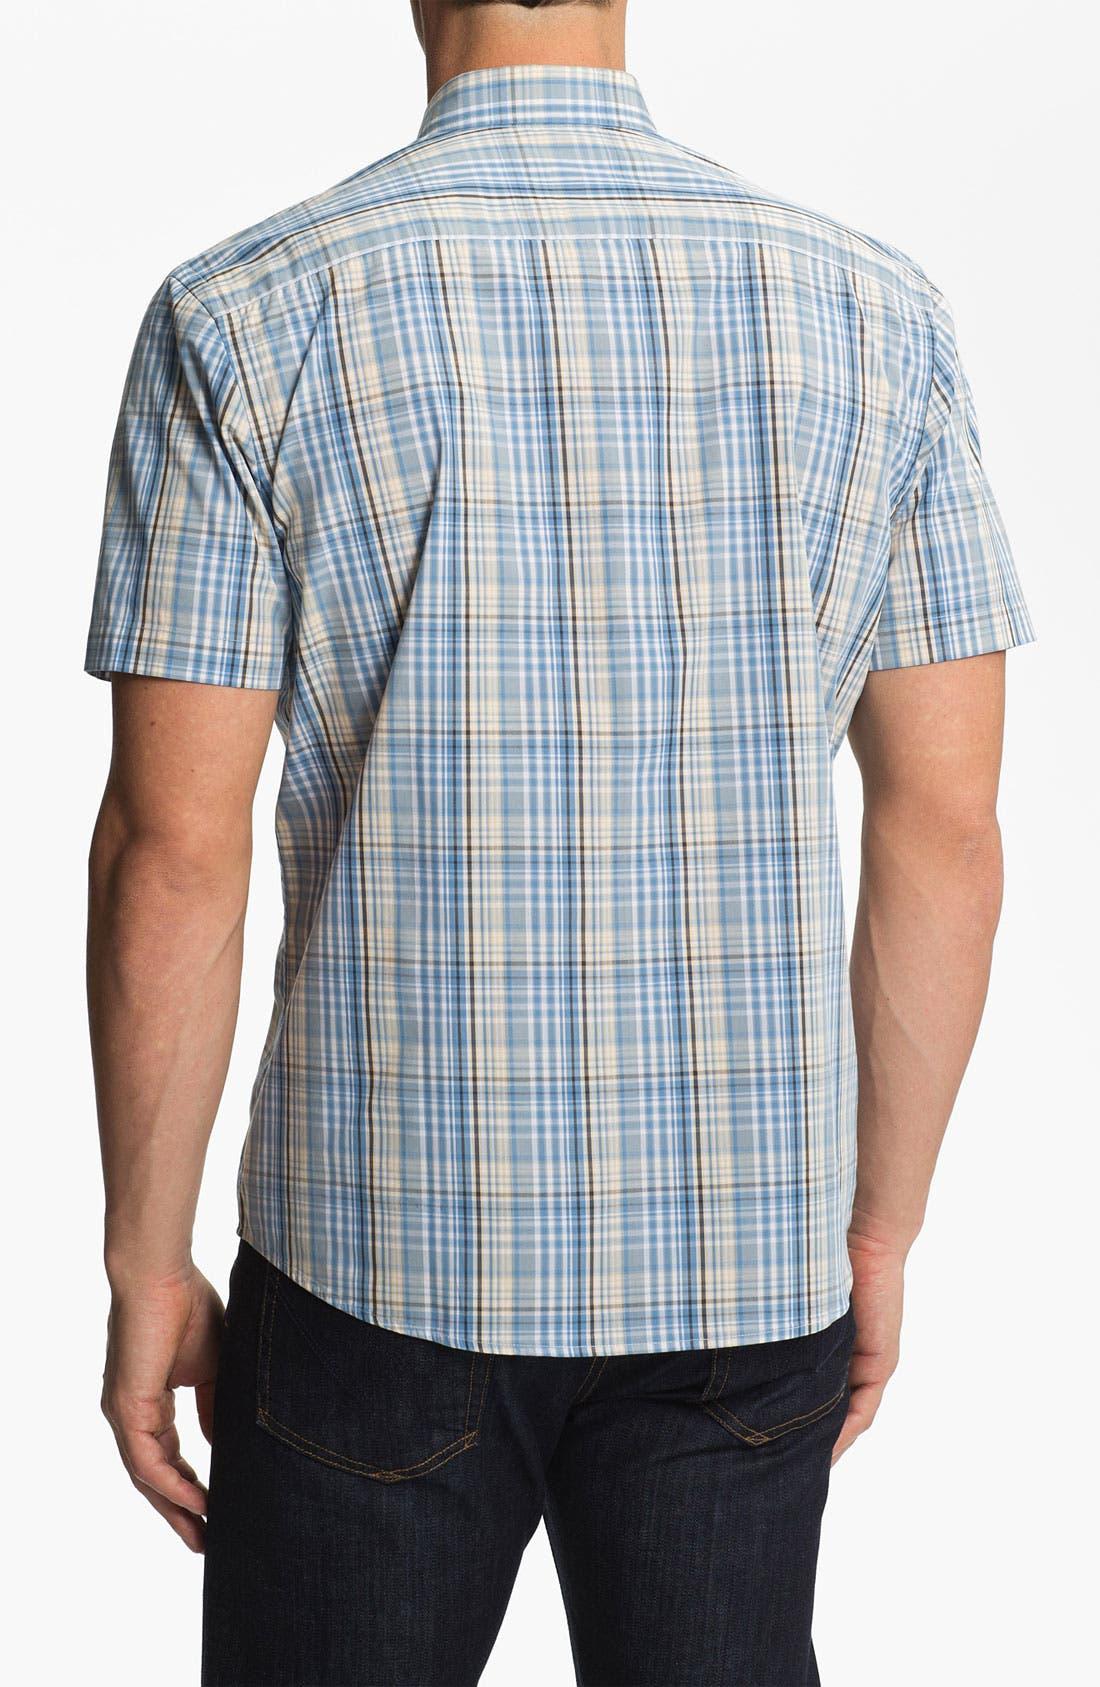 Alternate Image 2  - Cutter & Buck 'Leary' Plaid Sport Shirt